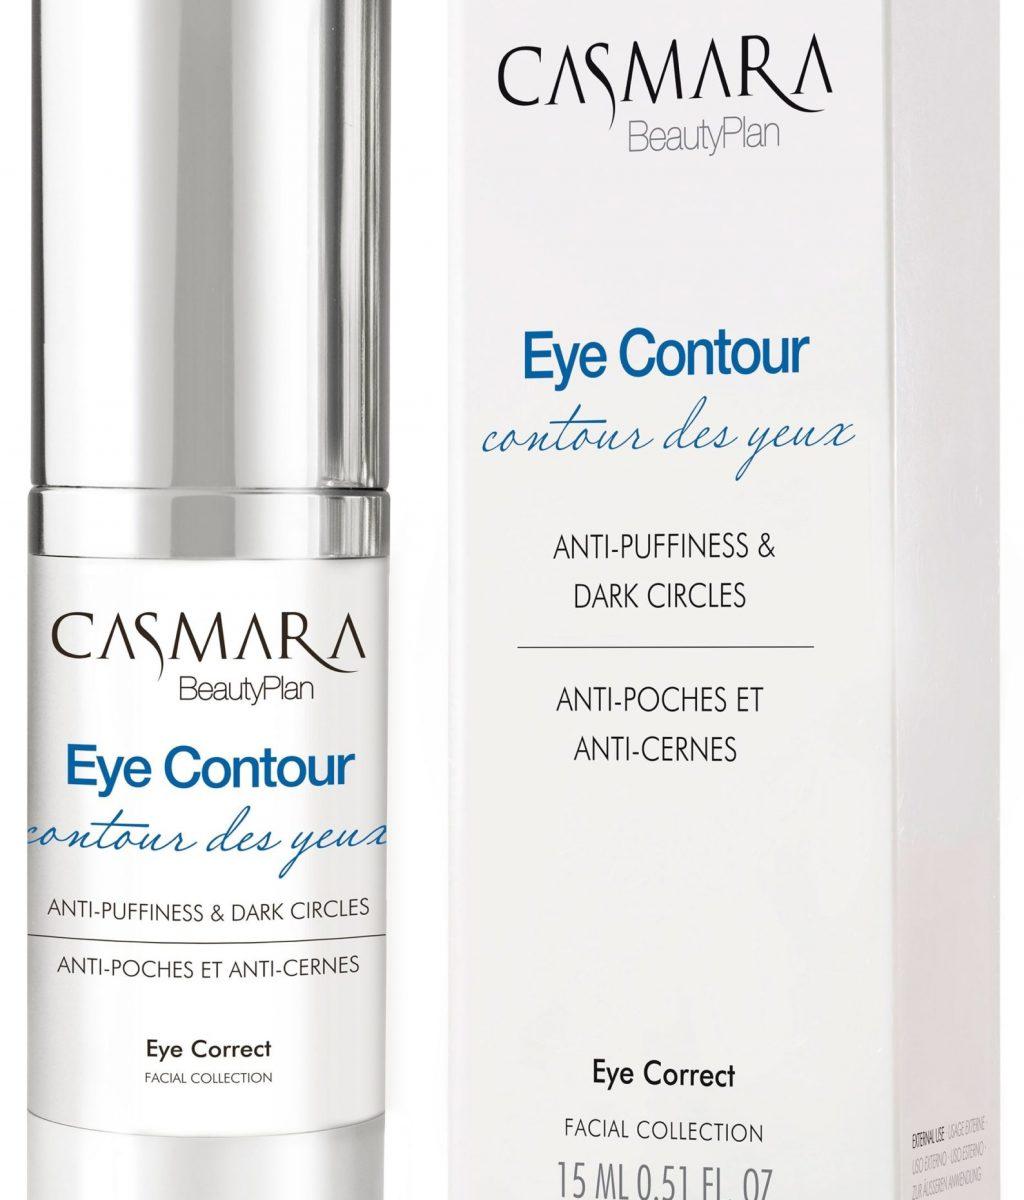 eyecontouranticernes